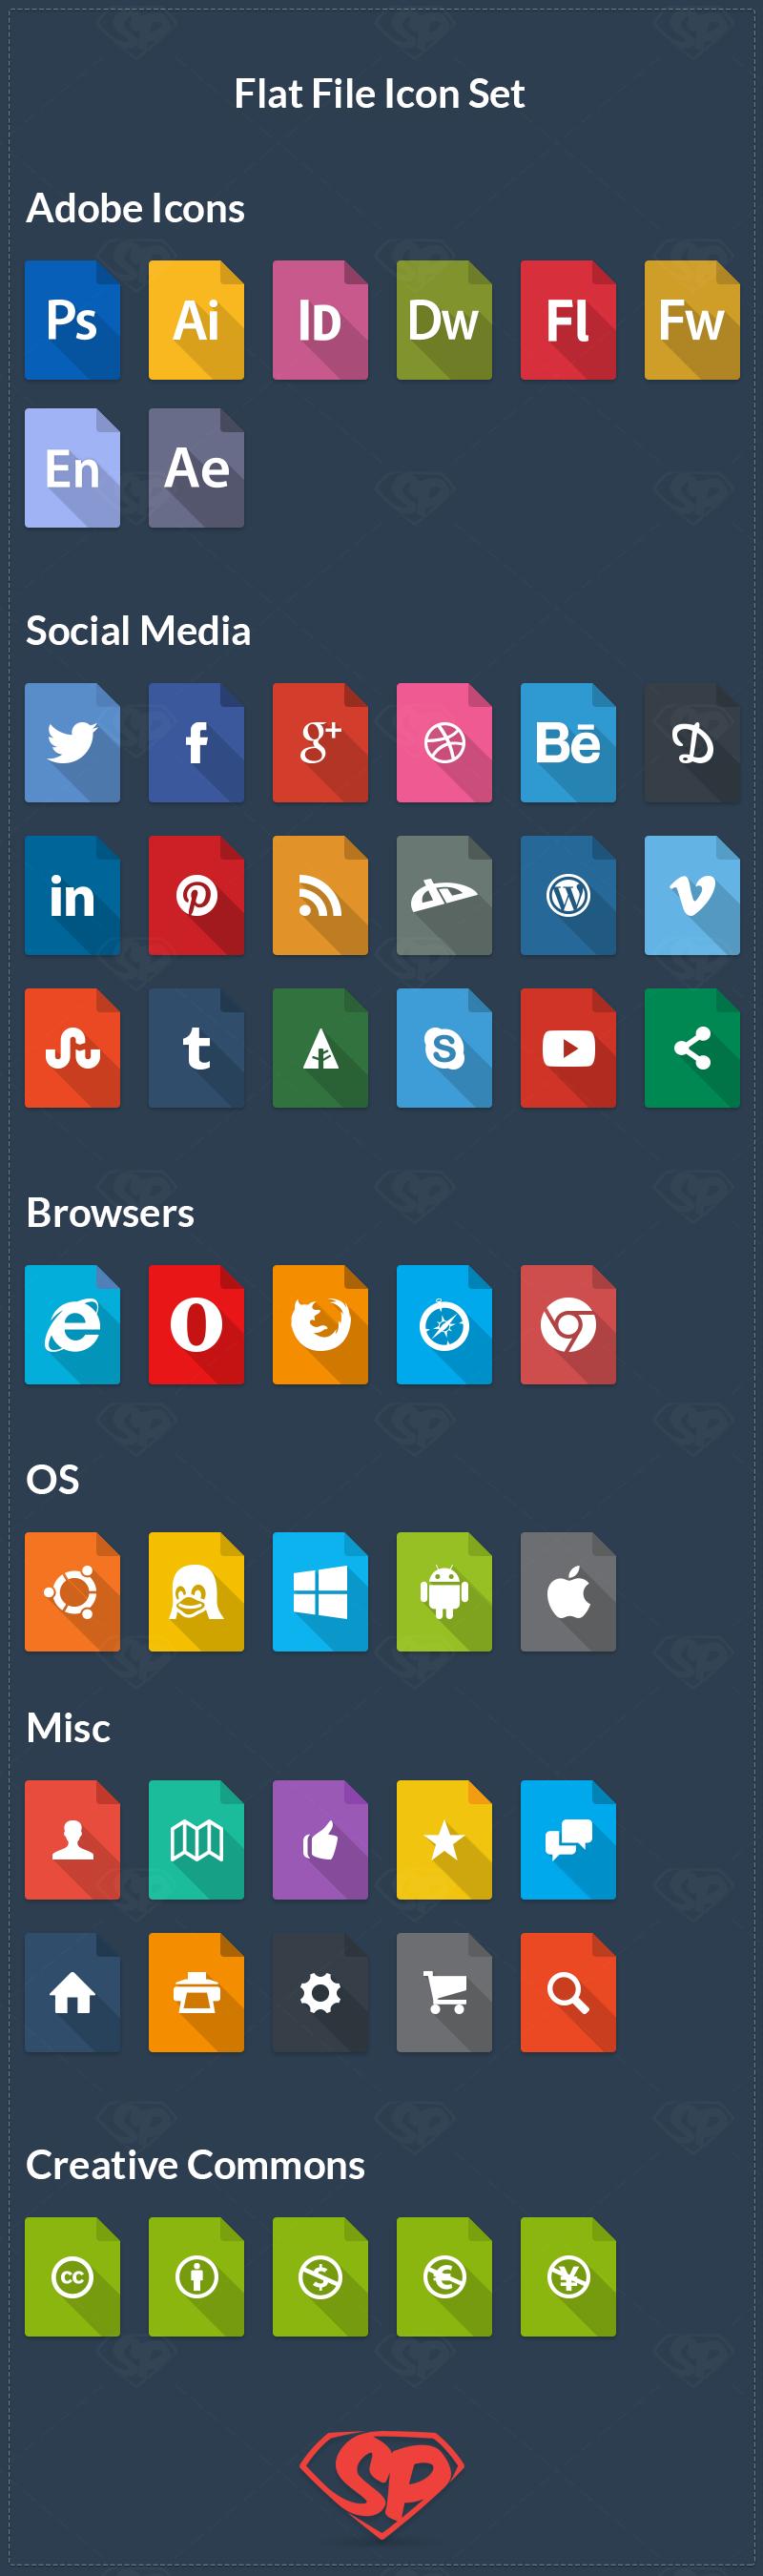 Flat File Icon Set